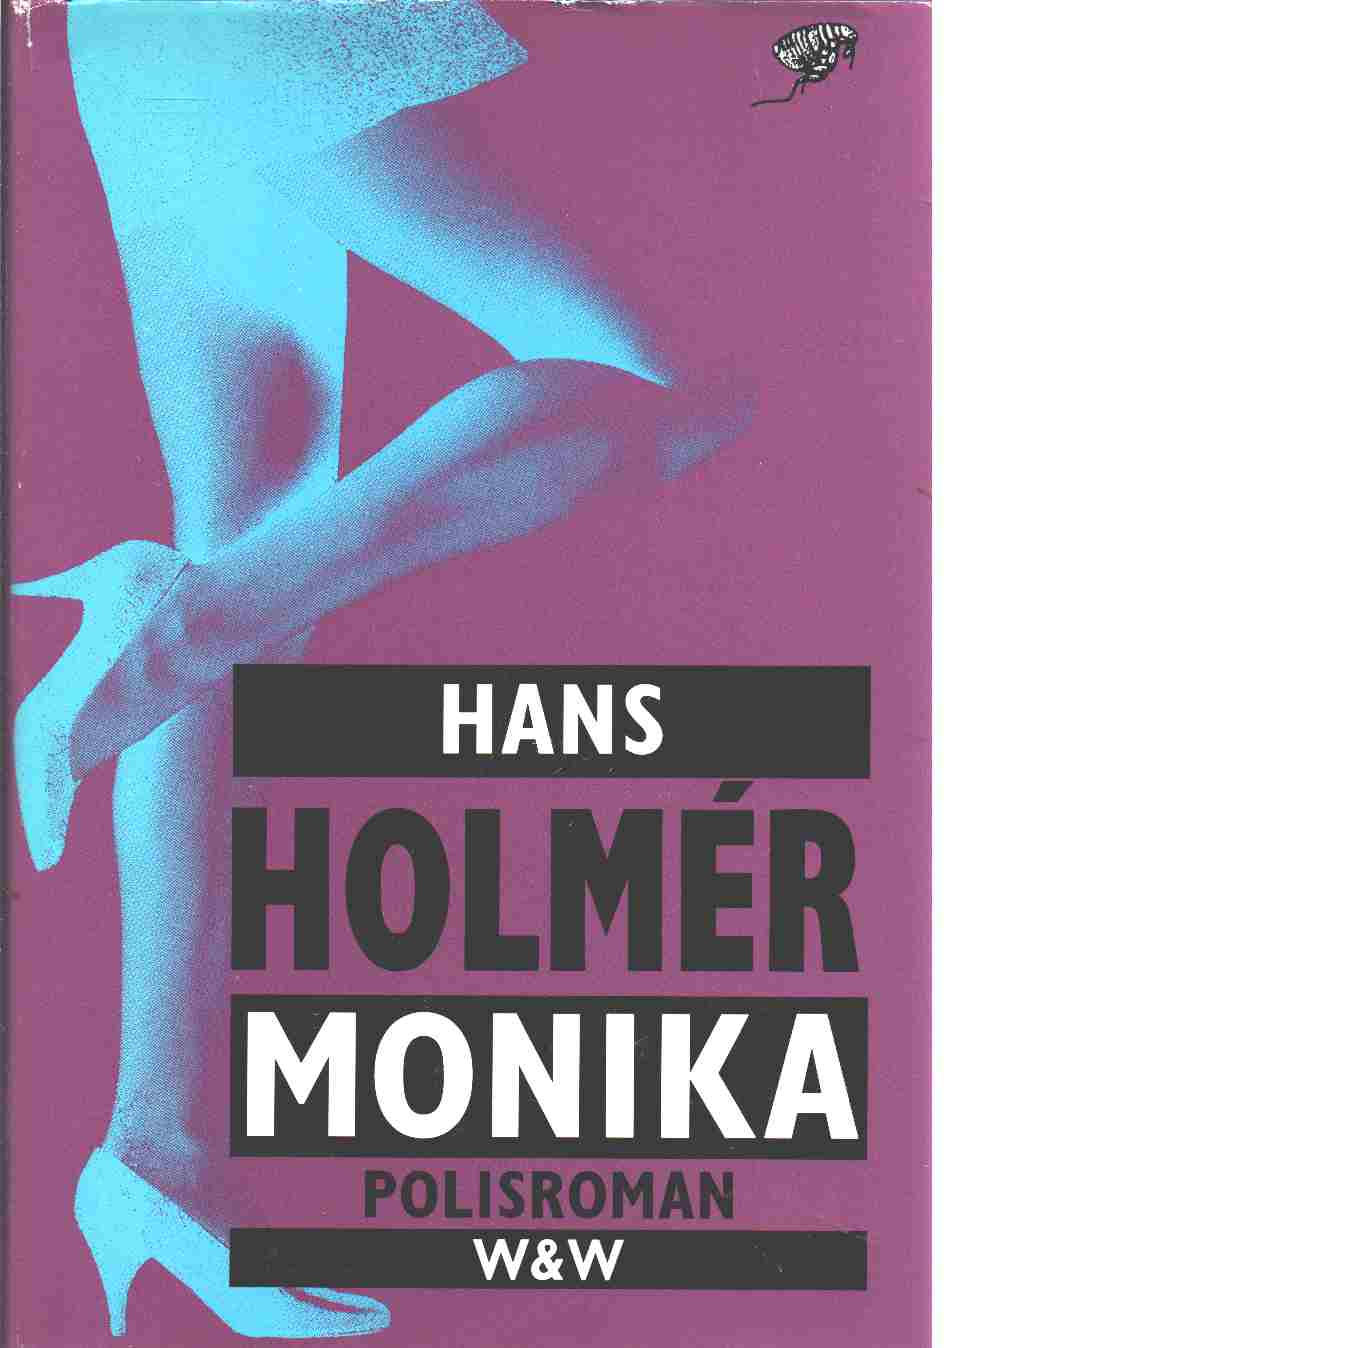 Monika - Holmér, Hans